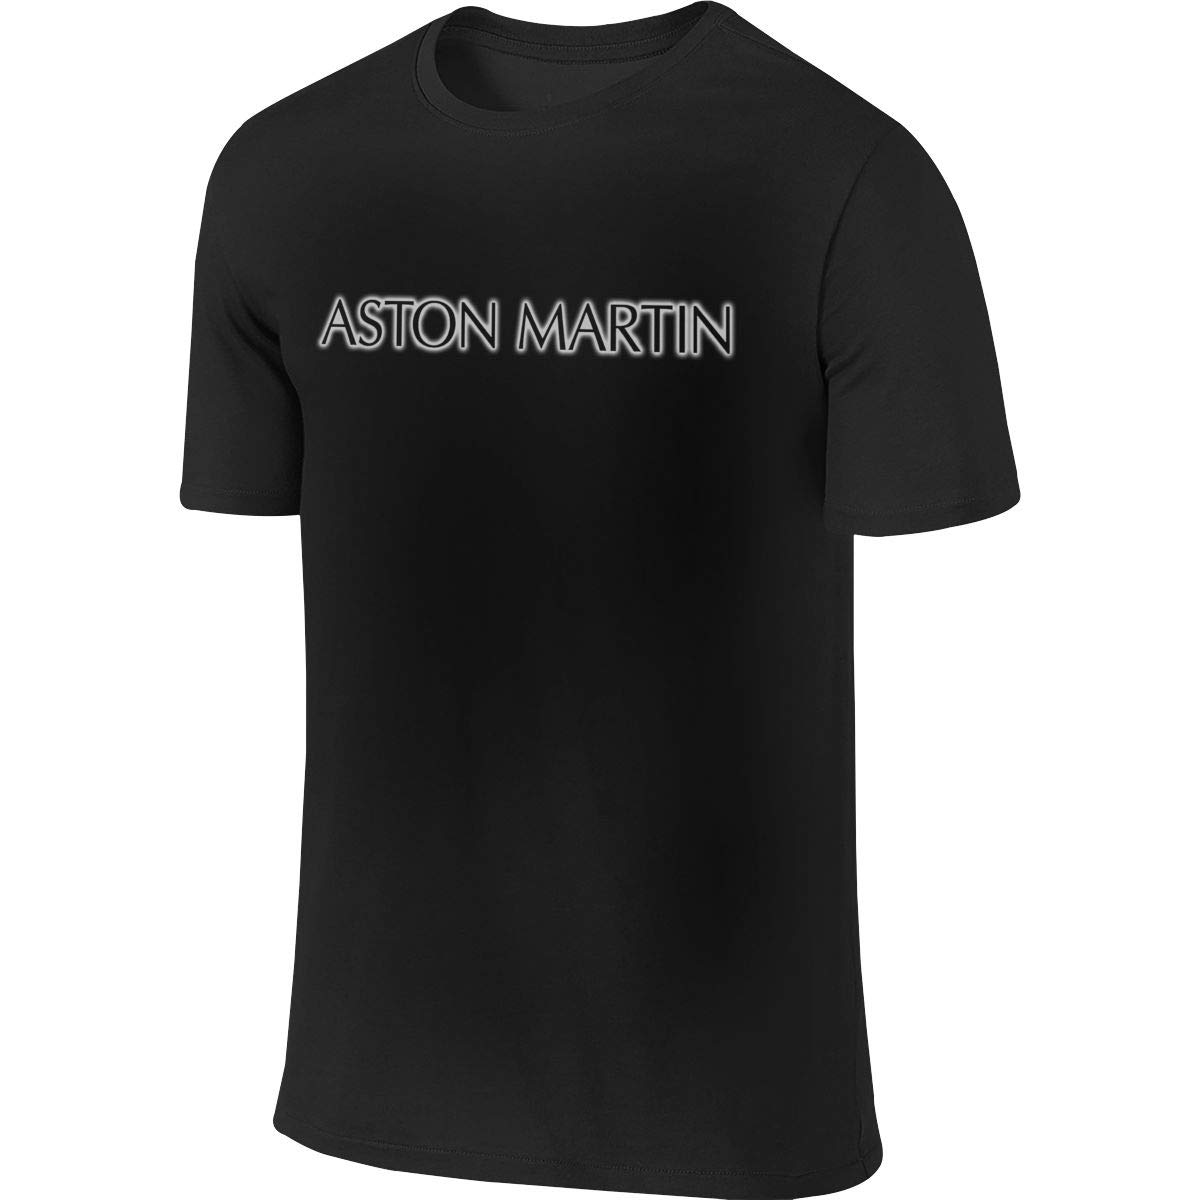 SHENGN Man Customized Cool Tee Aston Martin Logo Tshirt